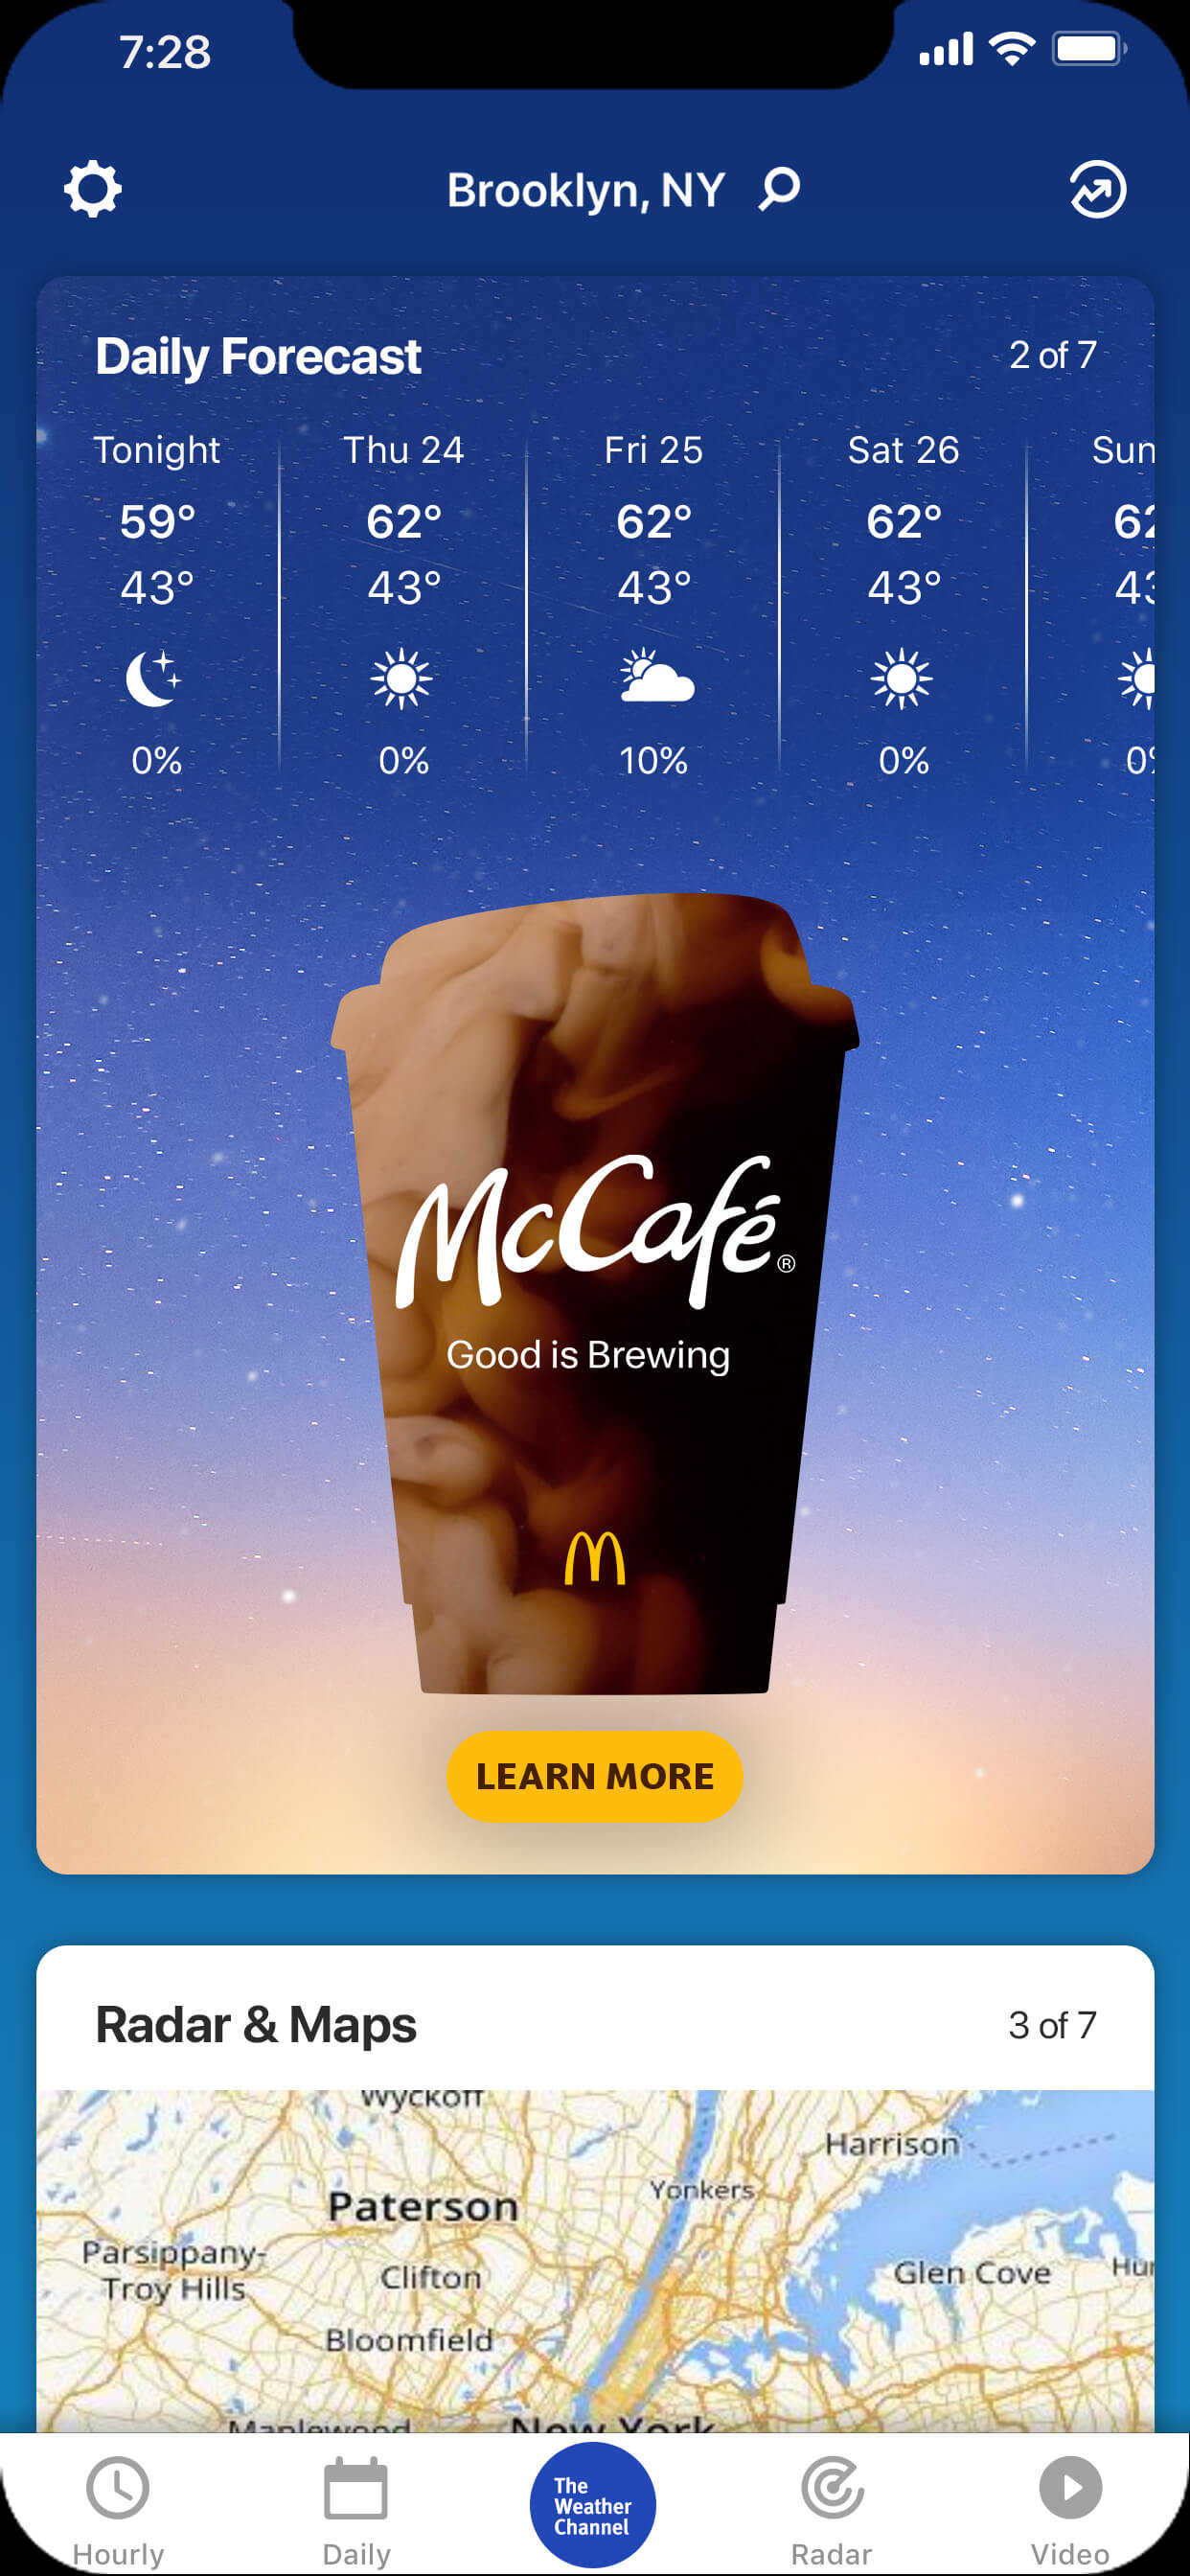 McCafe_IF_McCade_IF_002_clear_night